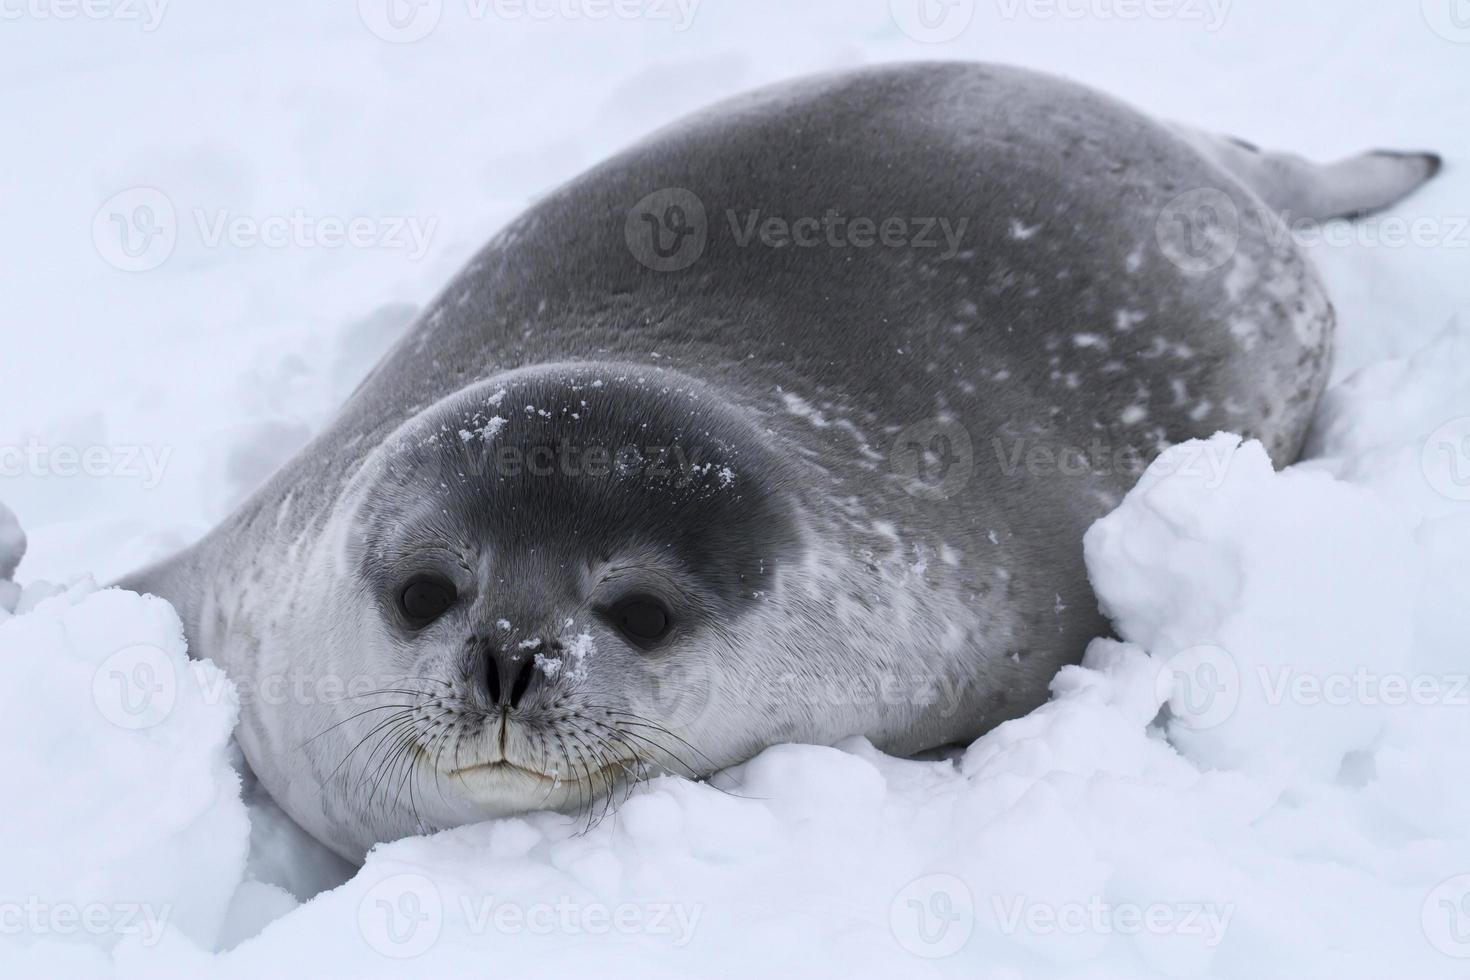 filhote de foca weddell na neve na Antártica foto